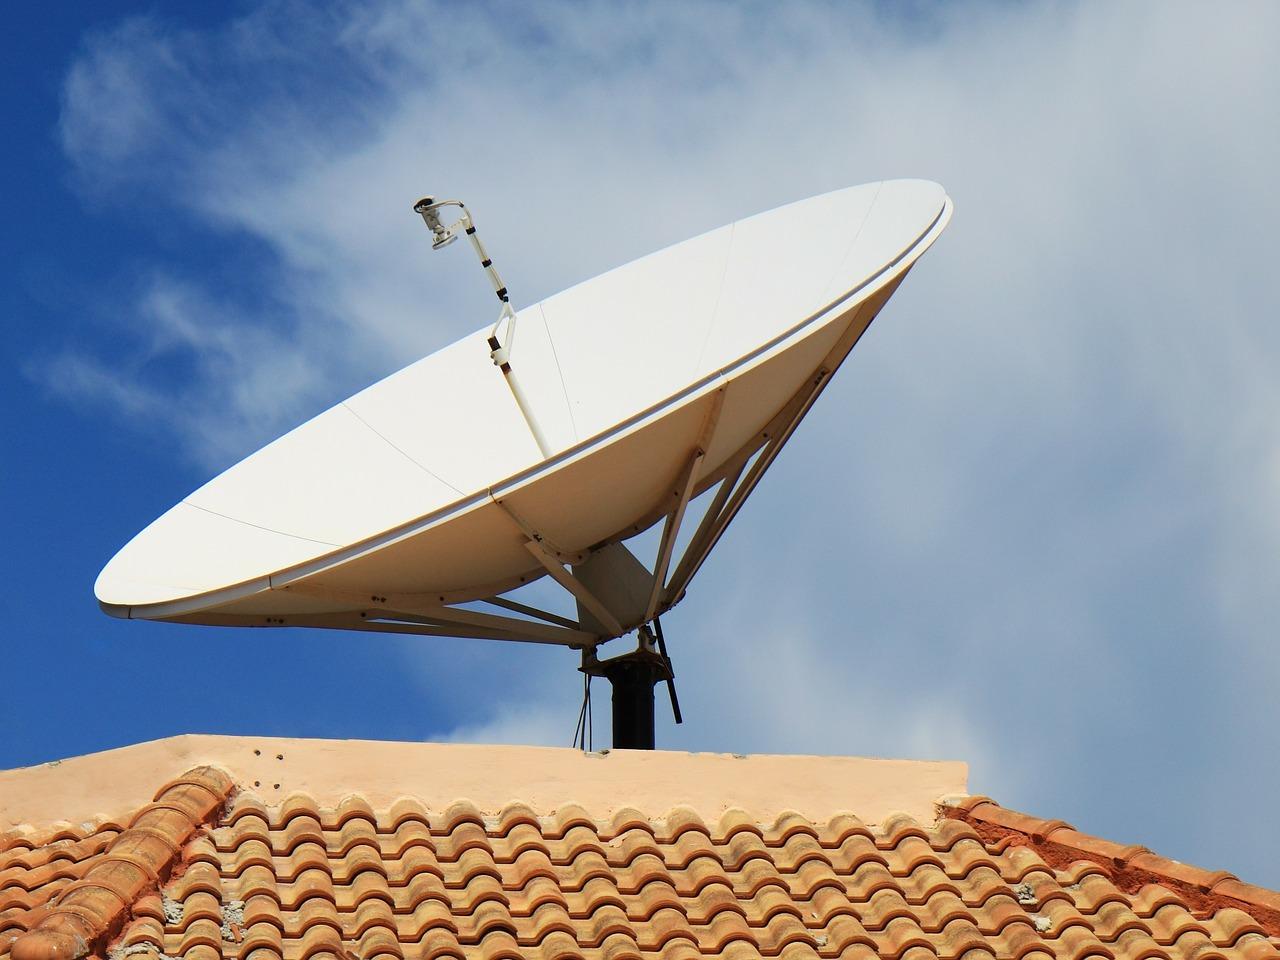 Antenas Mallorca: conoce sus características